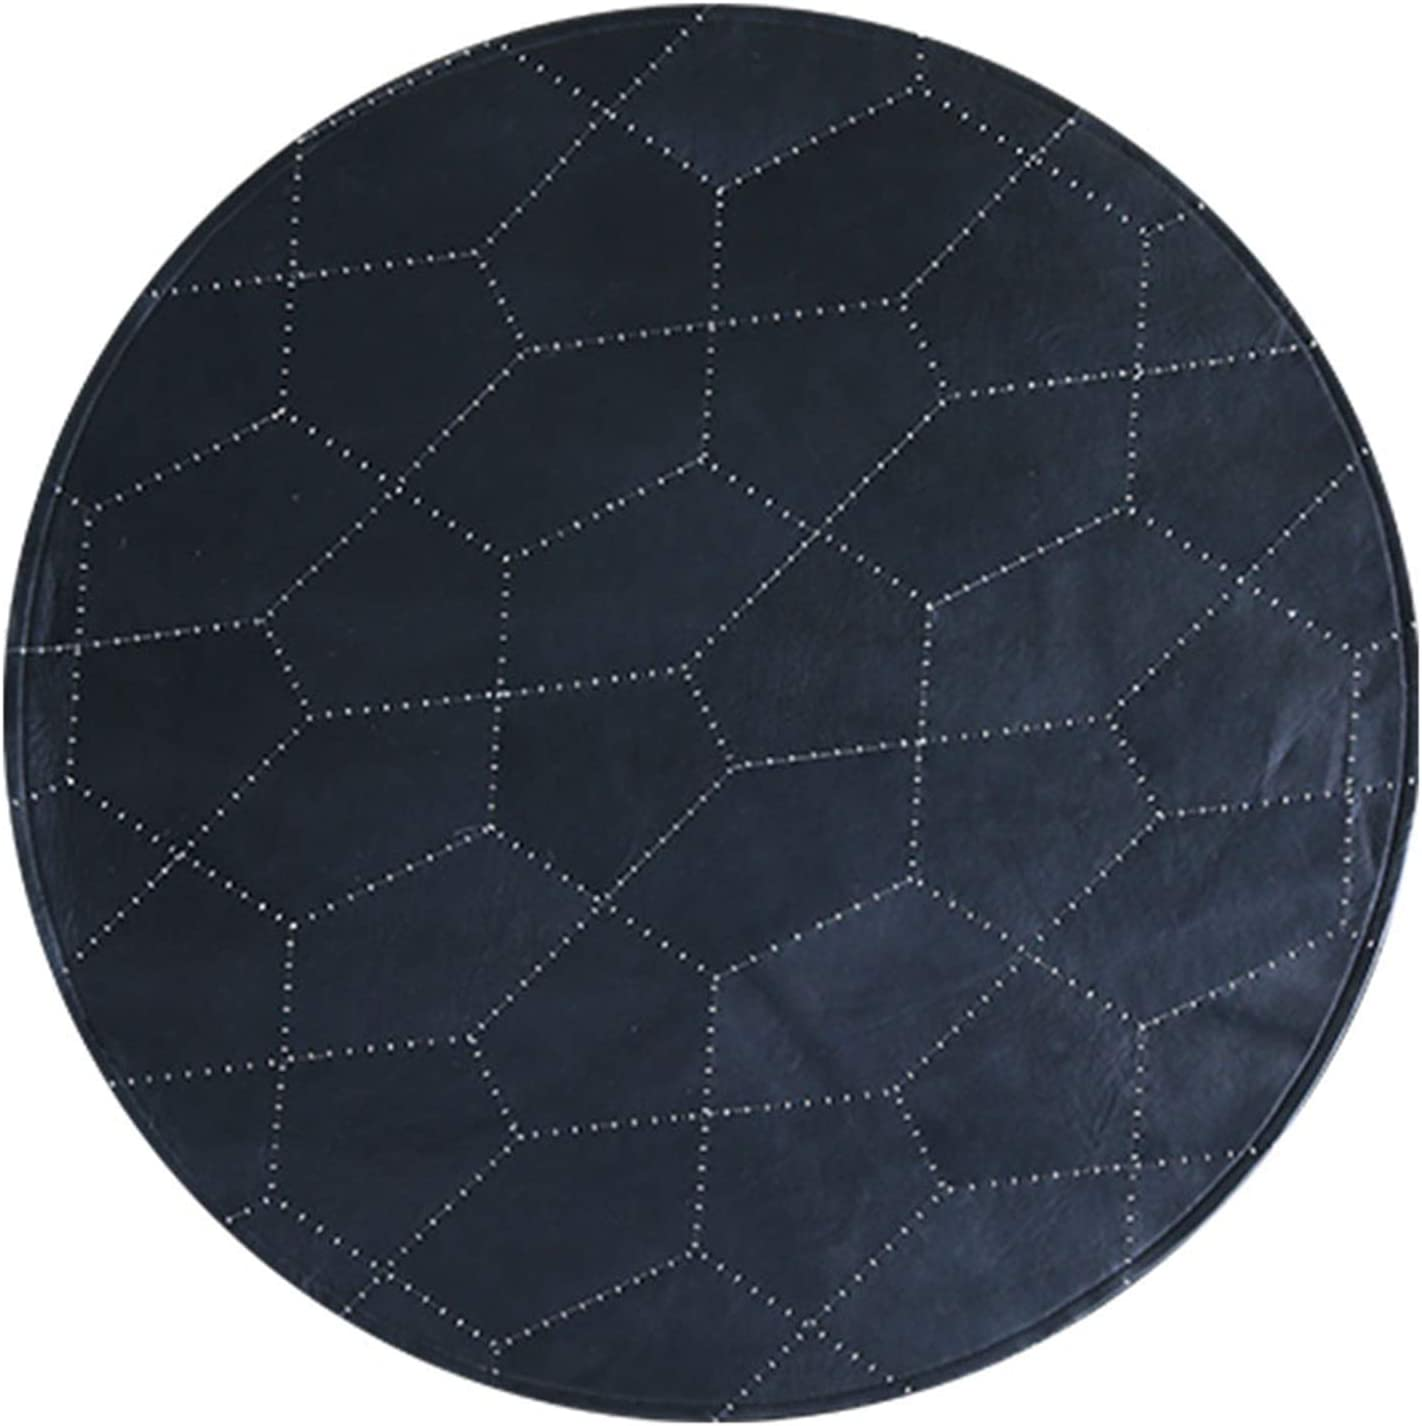 QDY Dark Blue Leather Cheap sale Rugs - Cheap bargain Flo Chair Computer Coffee Table and